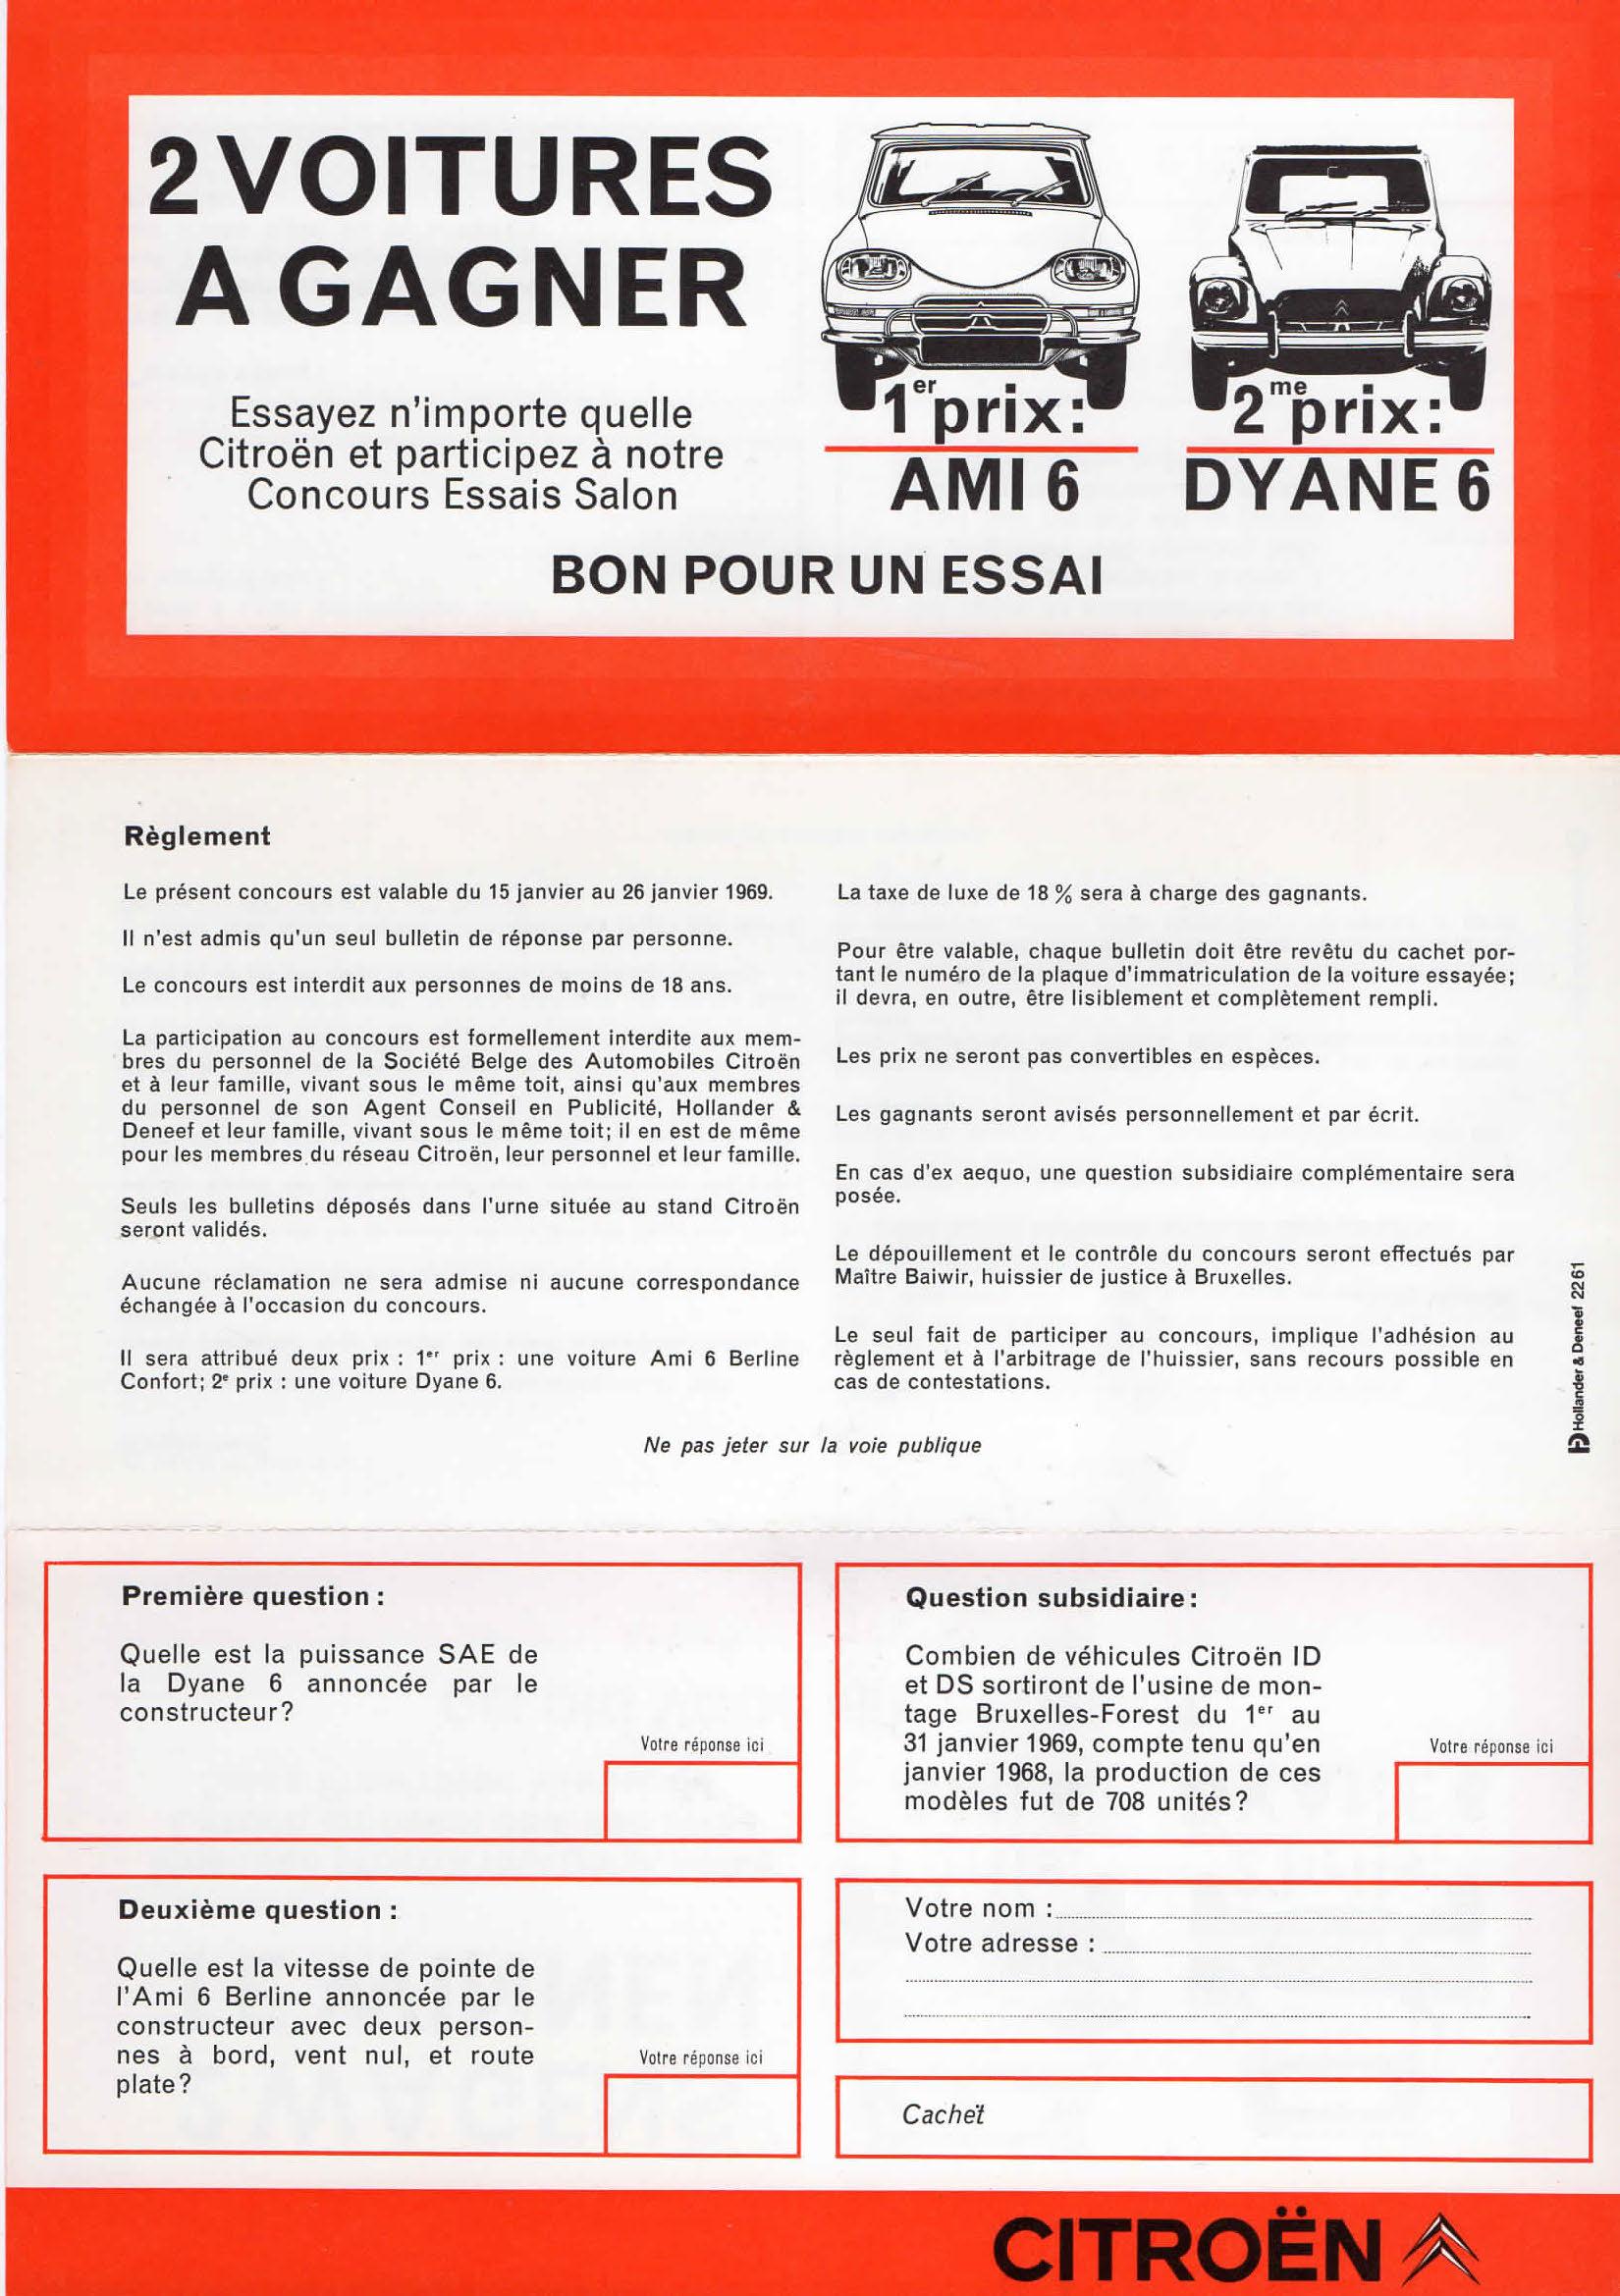 http://photosdyane.free.fr/uploads/1541172385.jpeg